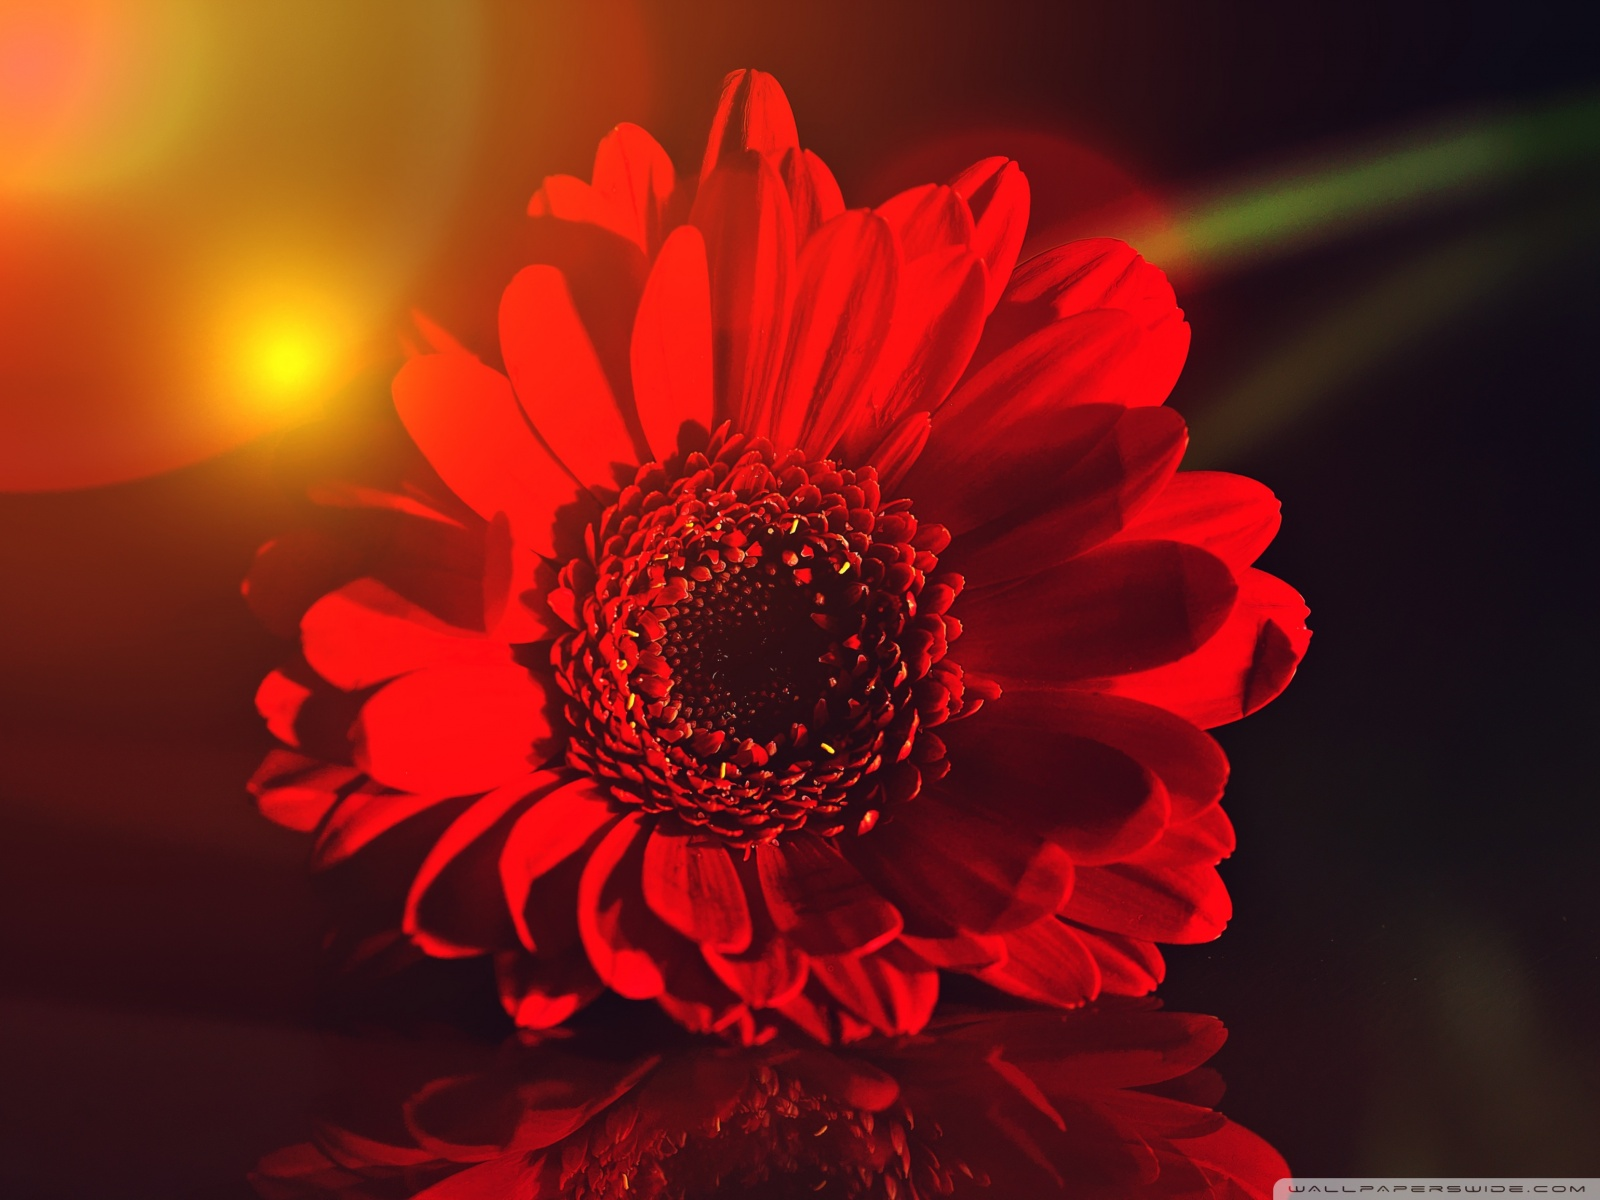 Free Dark Red Gerbera Daisy phone wallpaper by fetom08